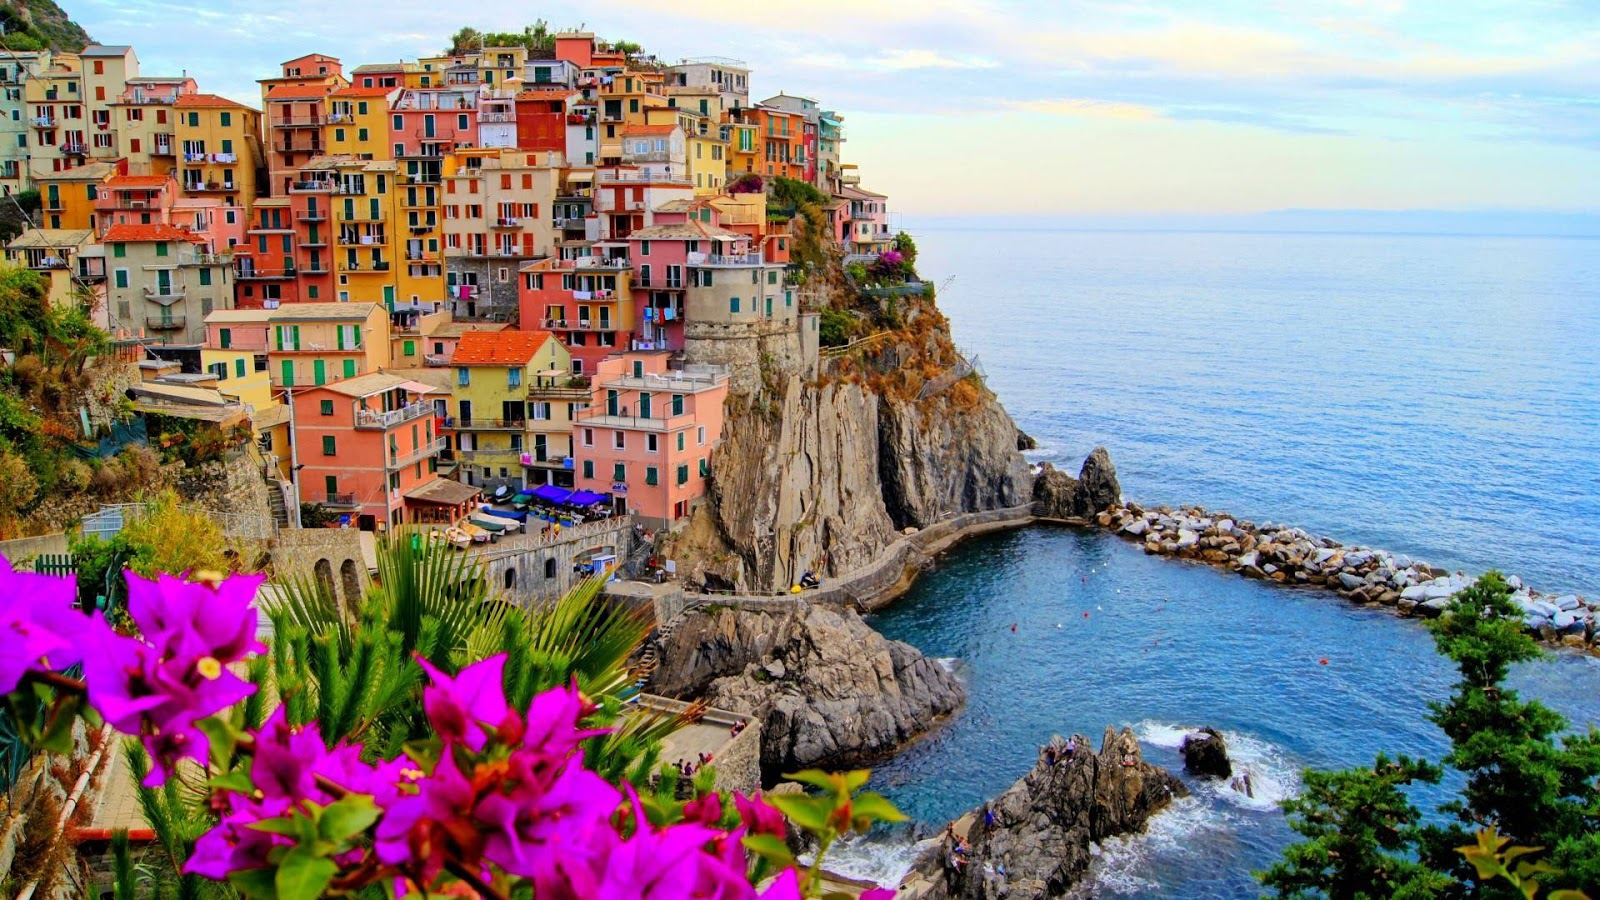 Manarola Italy Beautiful Coastal Village